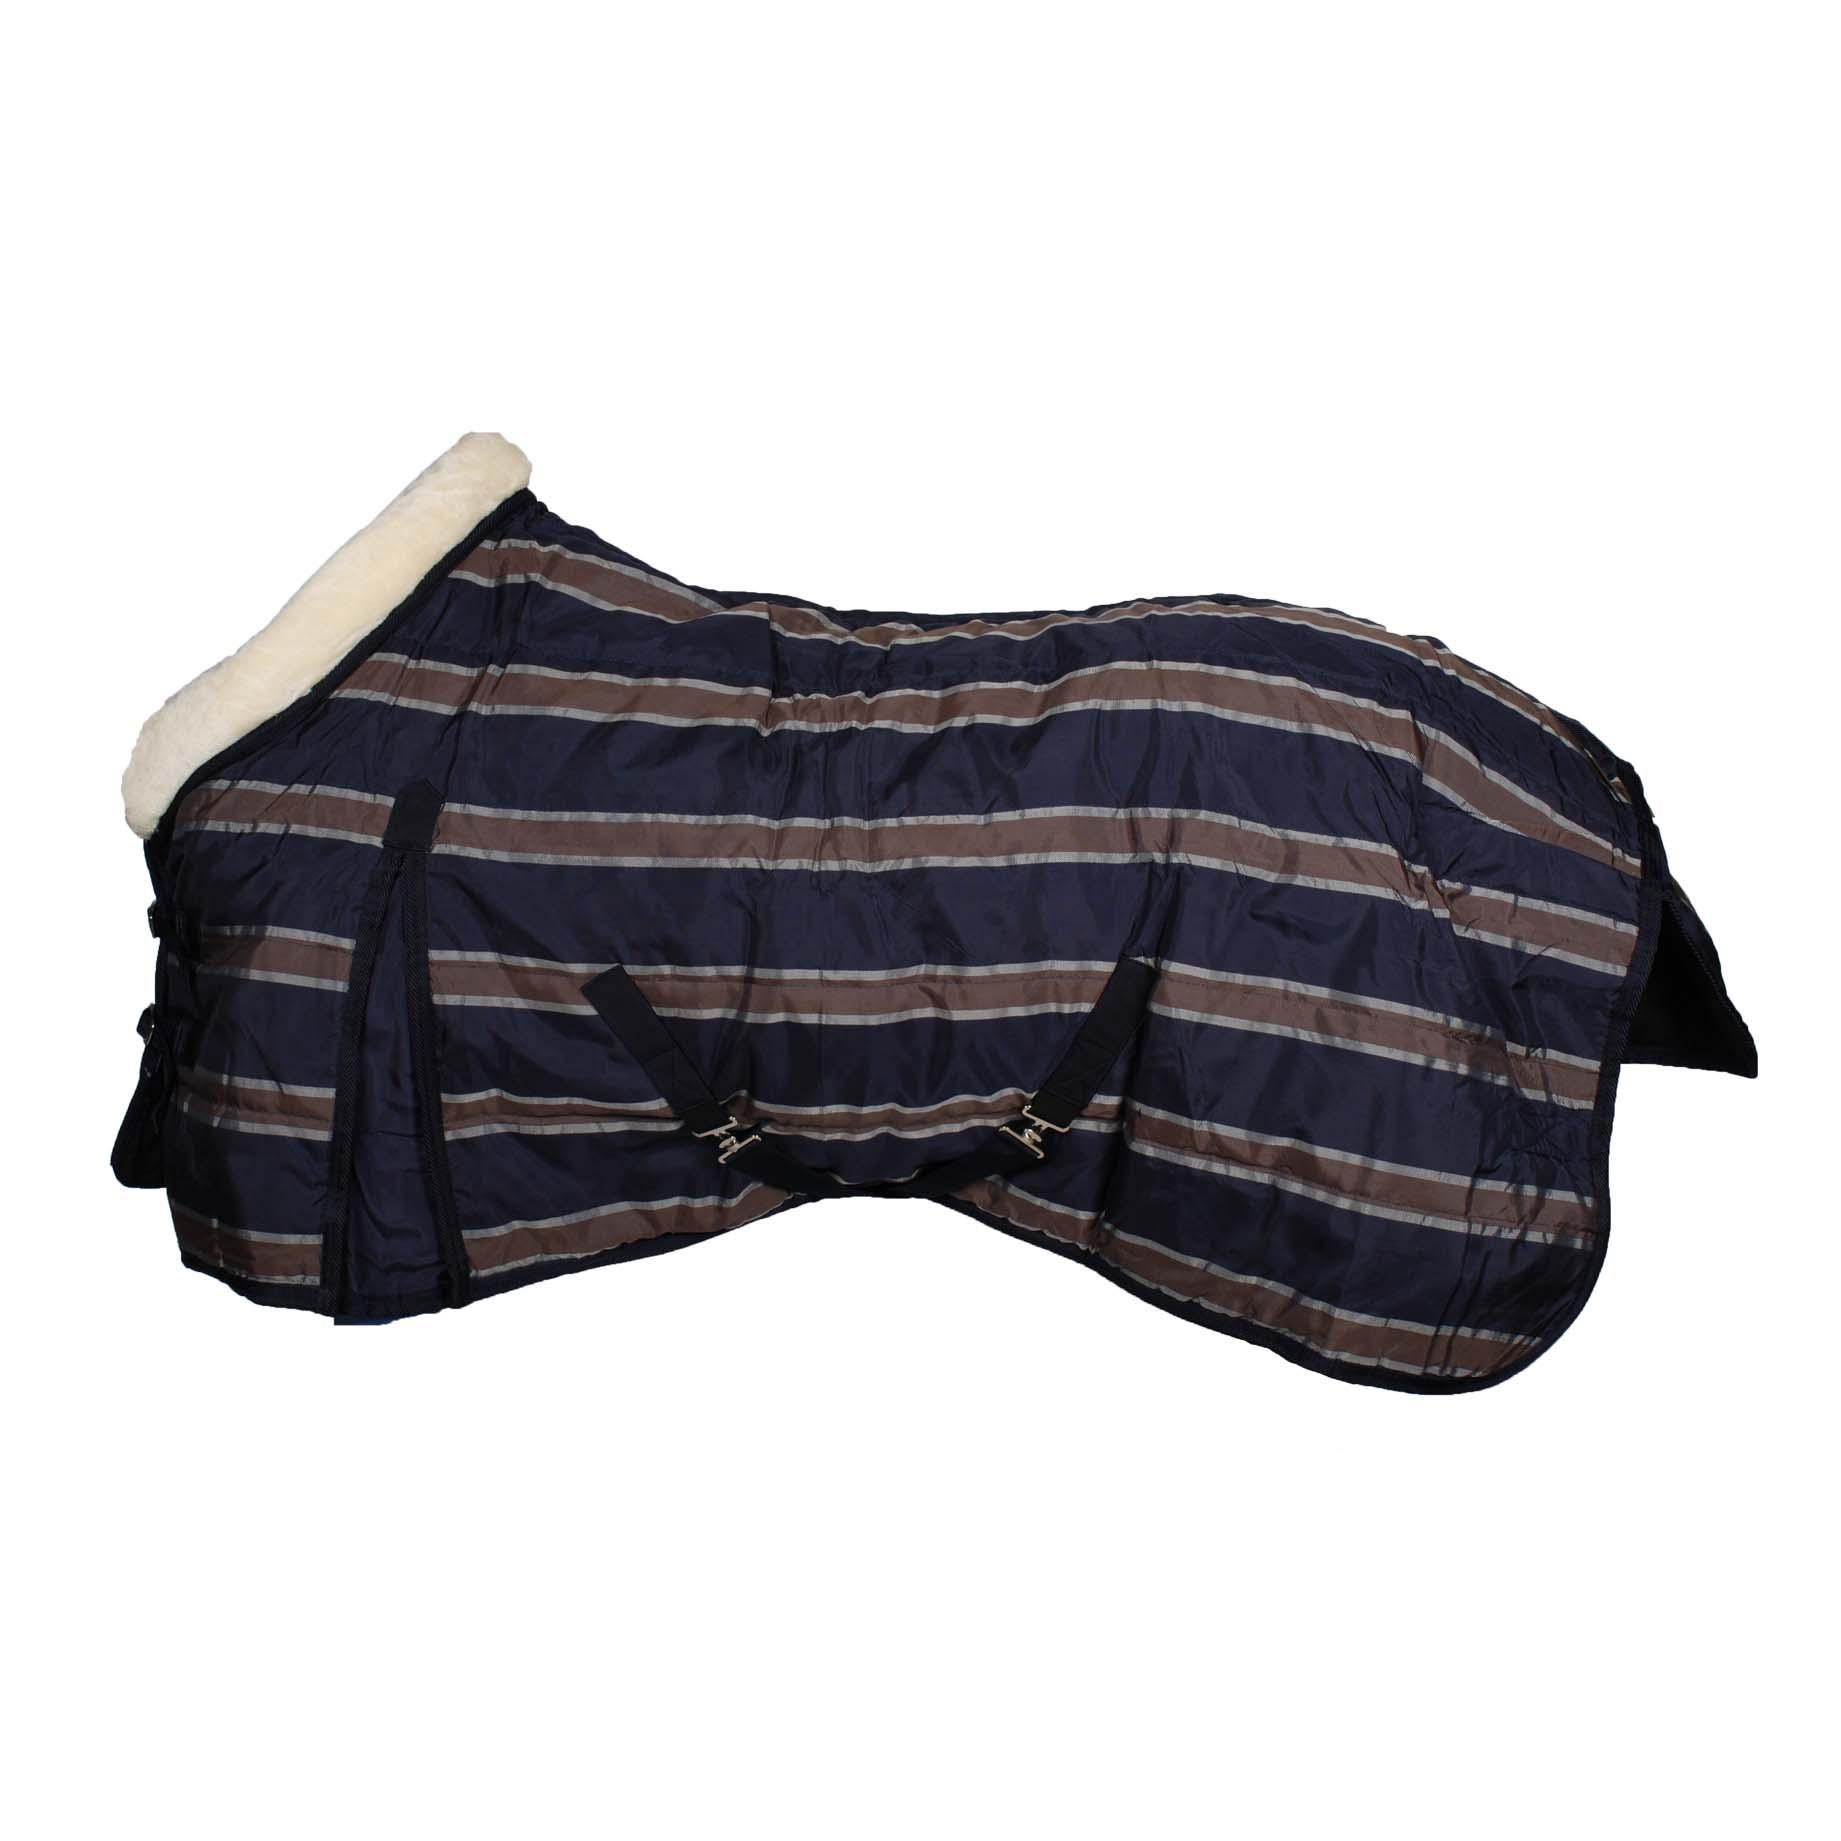 Pagony Stripe 220 staldeken donkerblauw maat:215